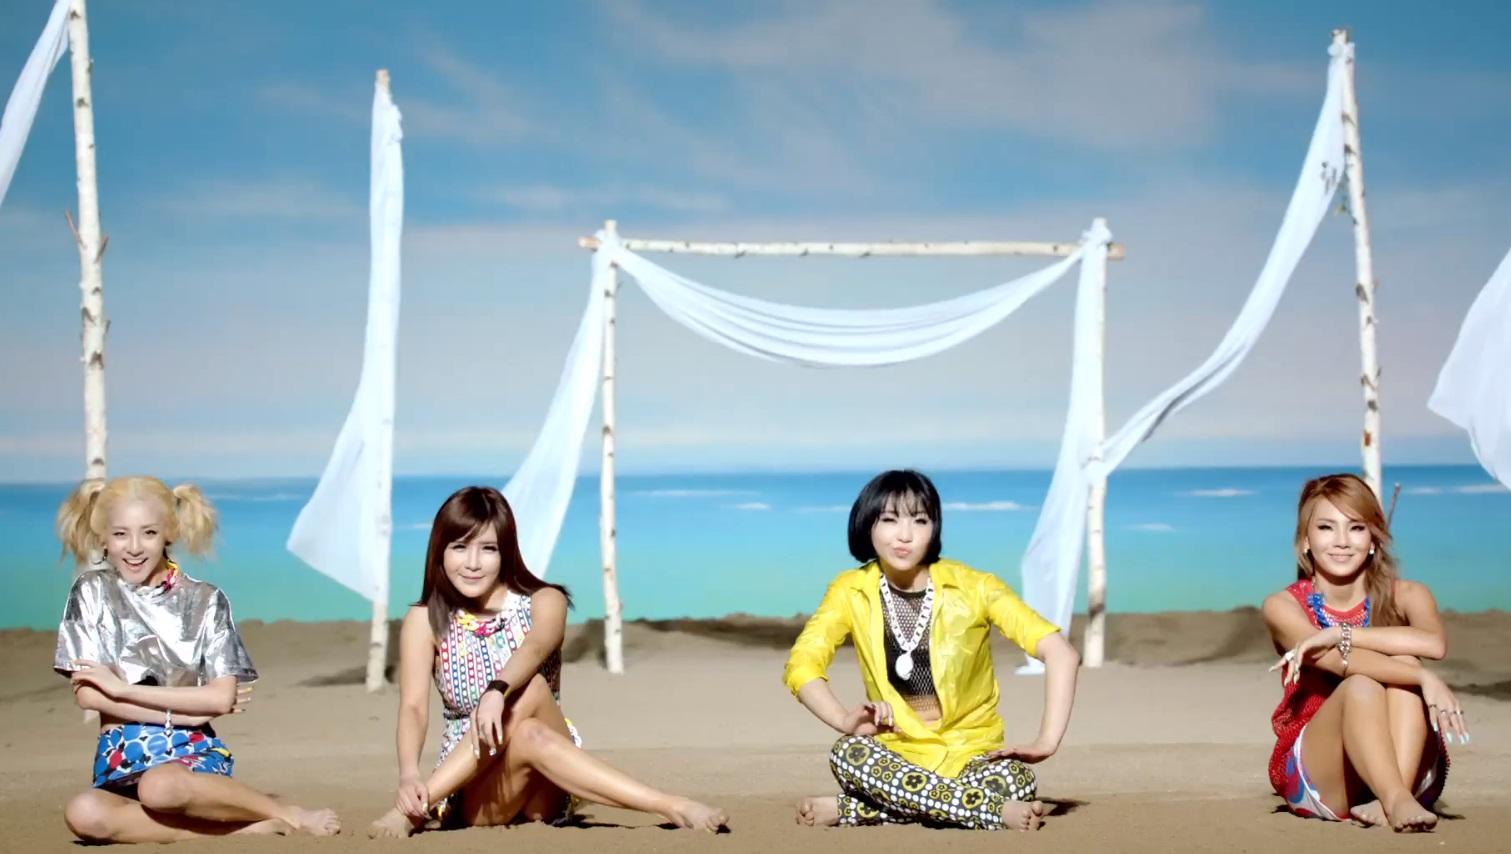 anti kpop fangirl blogspot